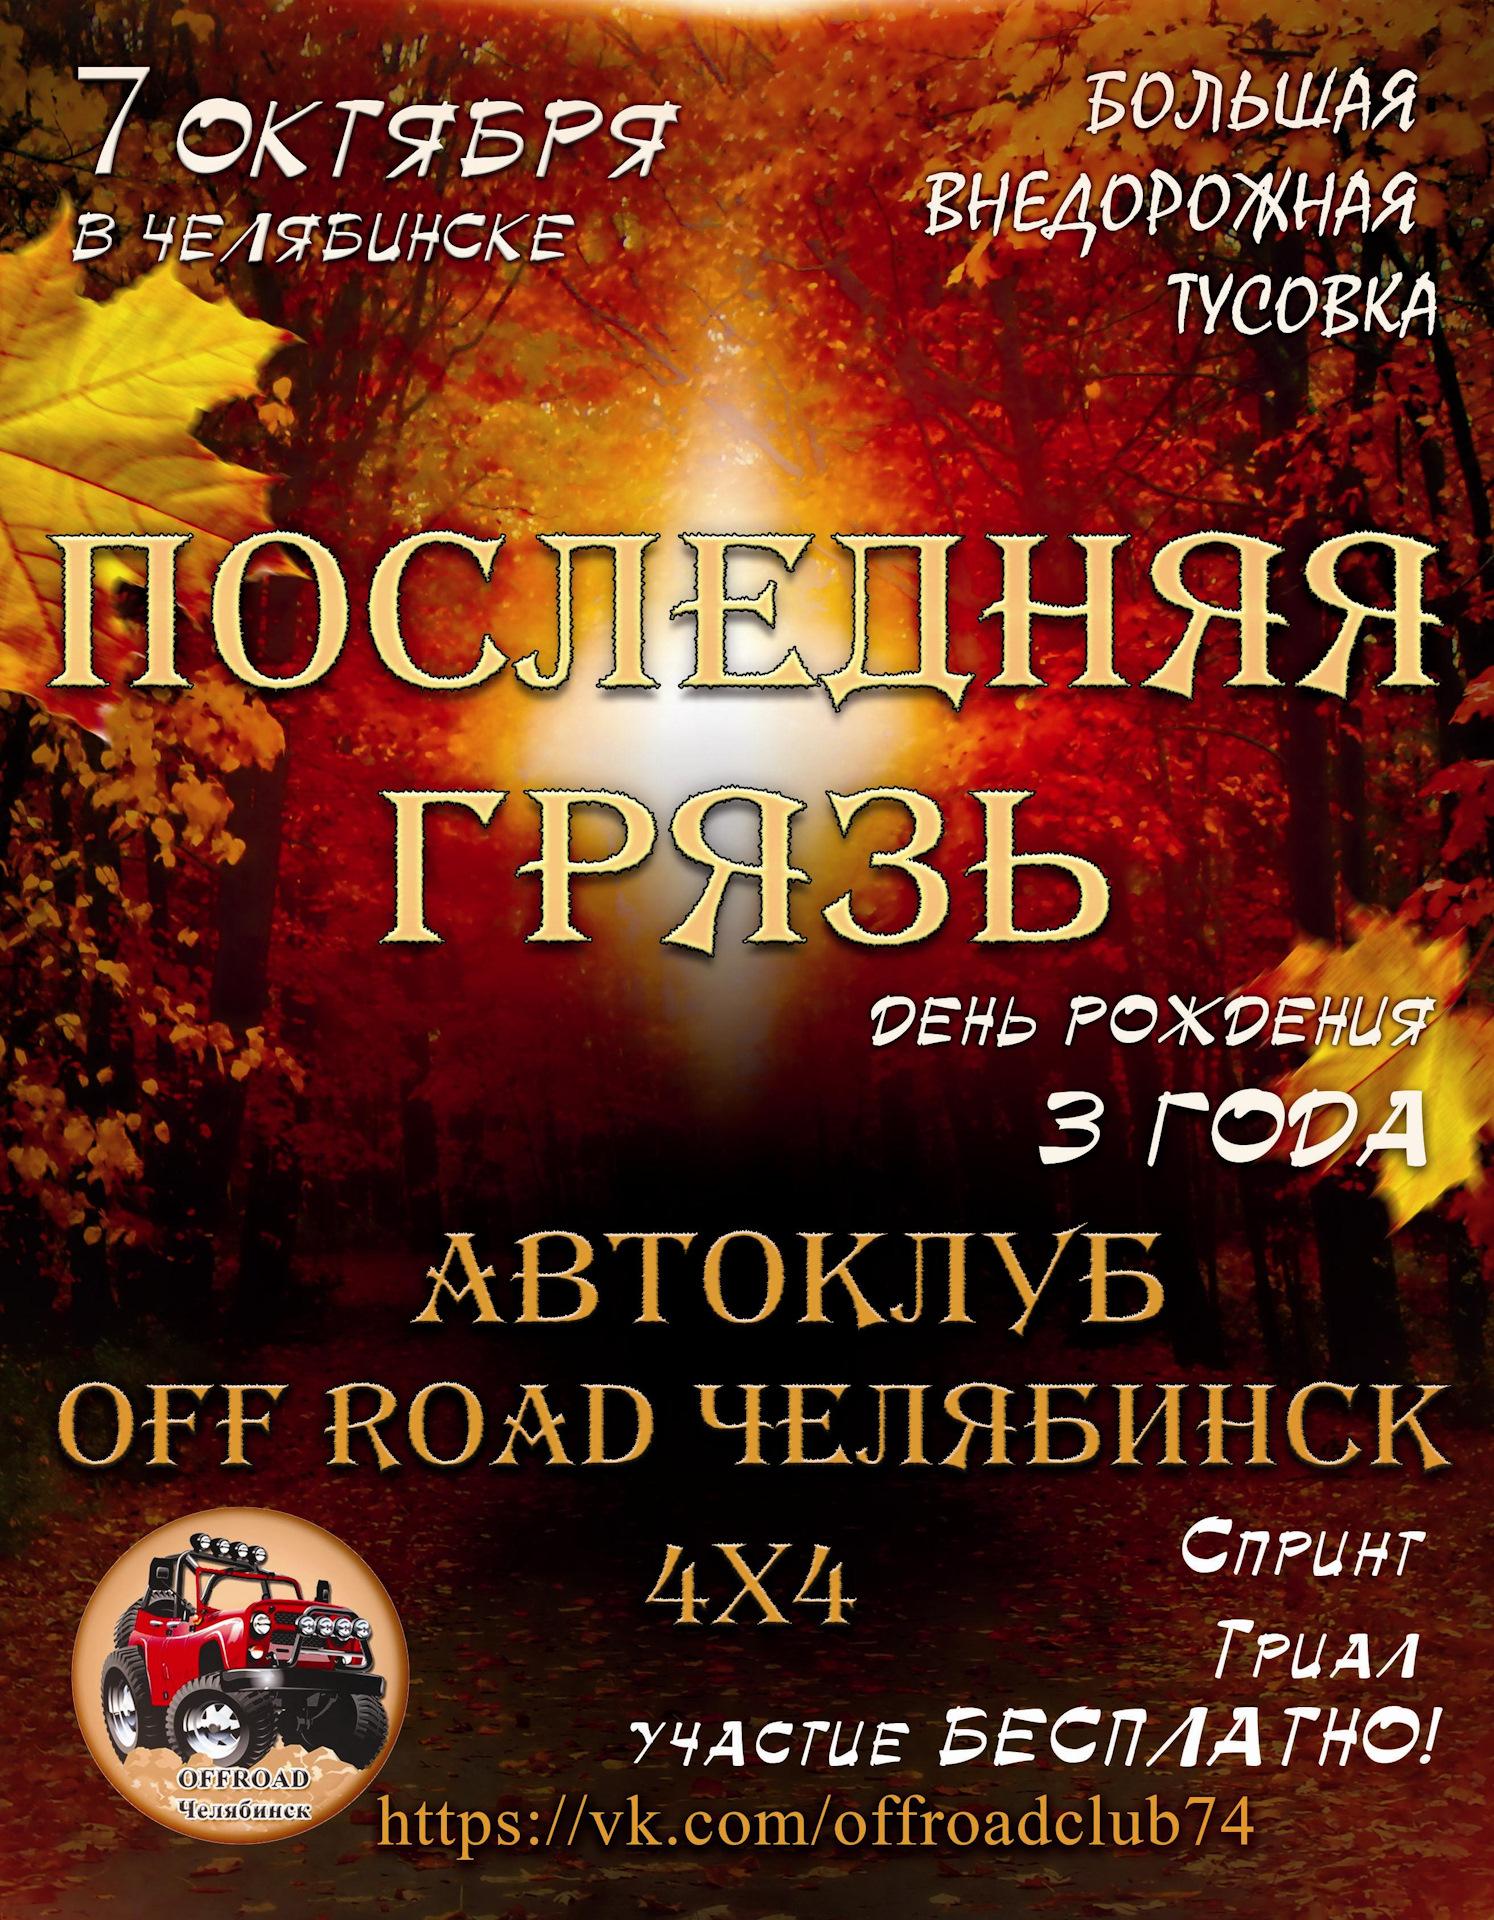 Road Book 4x4 En